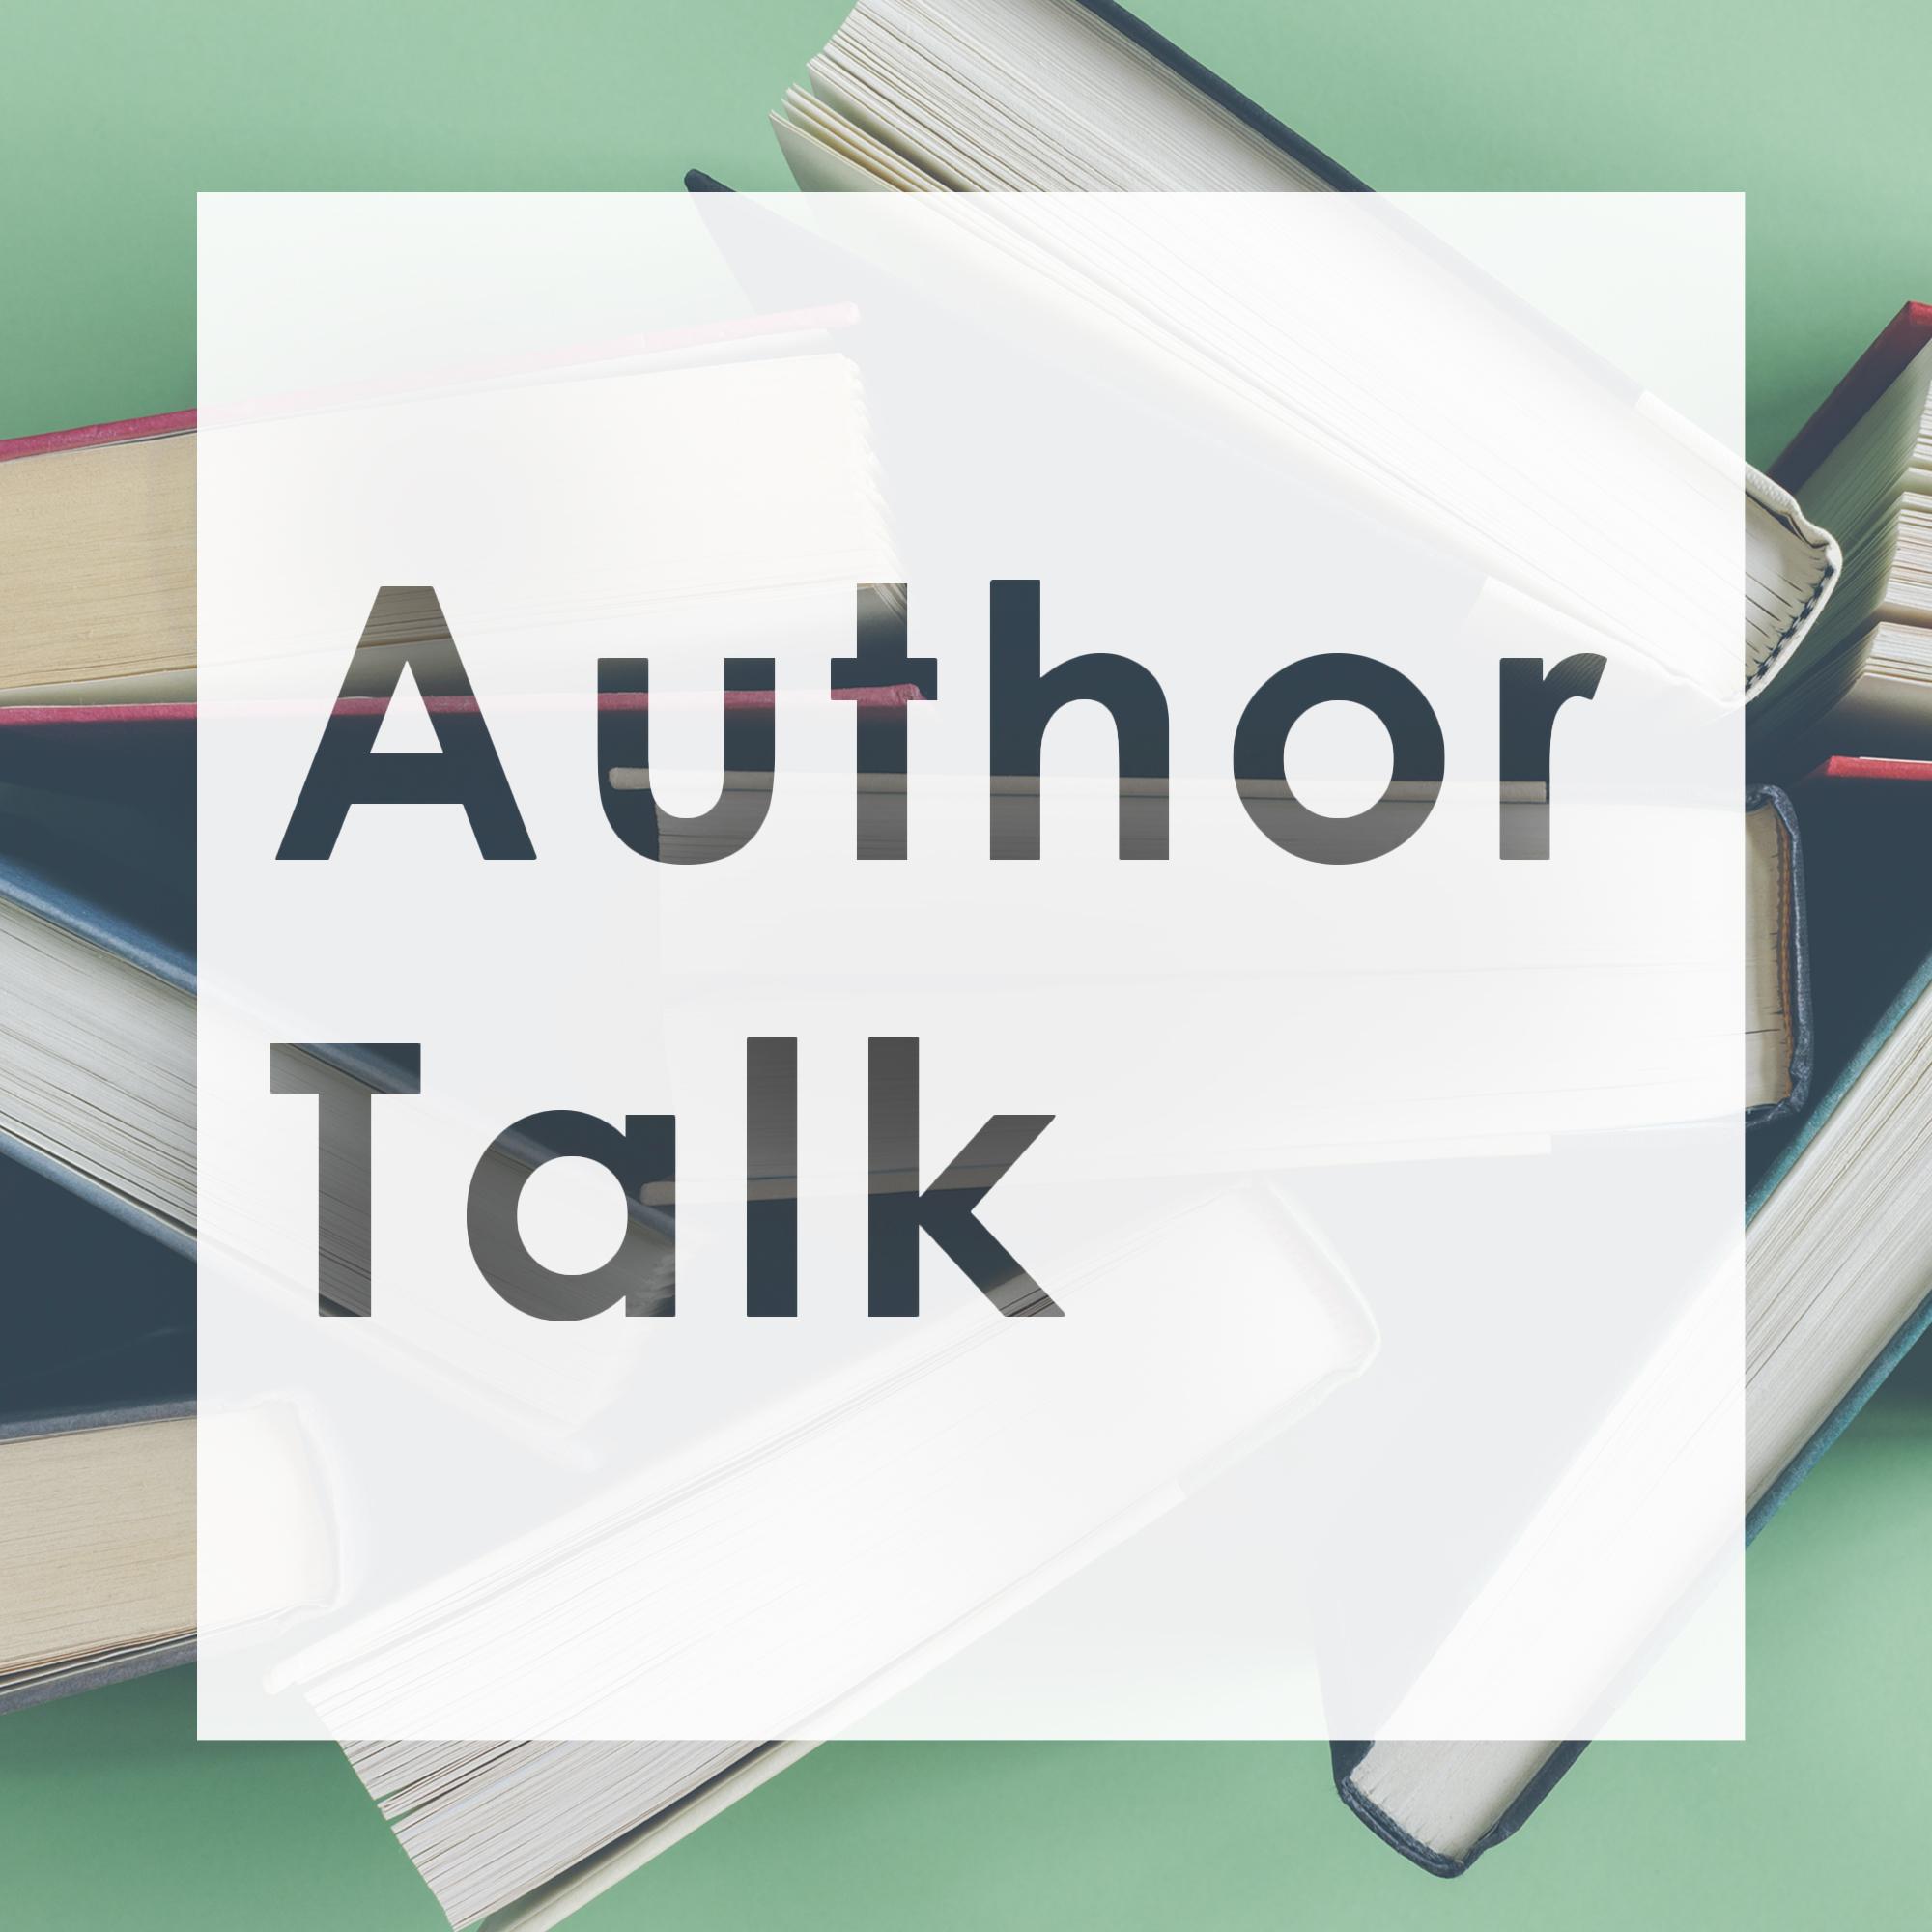 (Local) Author Visit: Katherine Kerestman